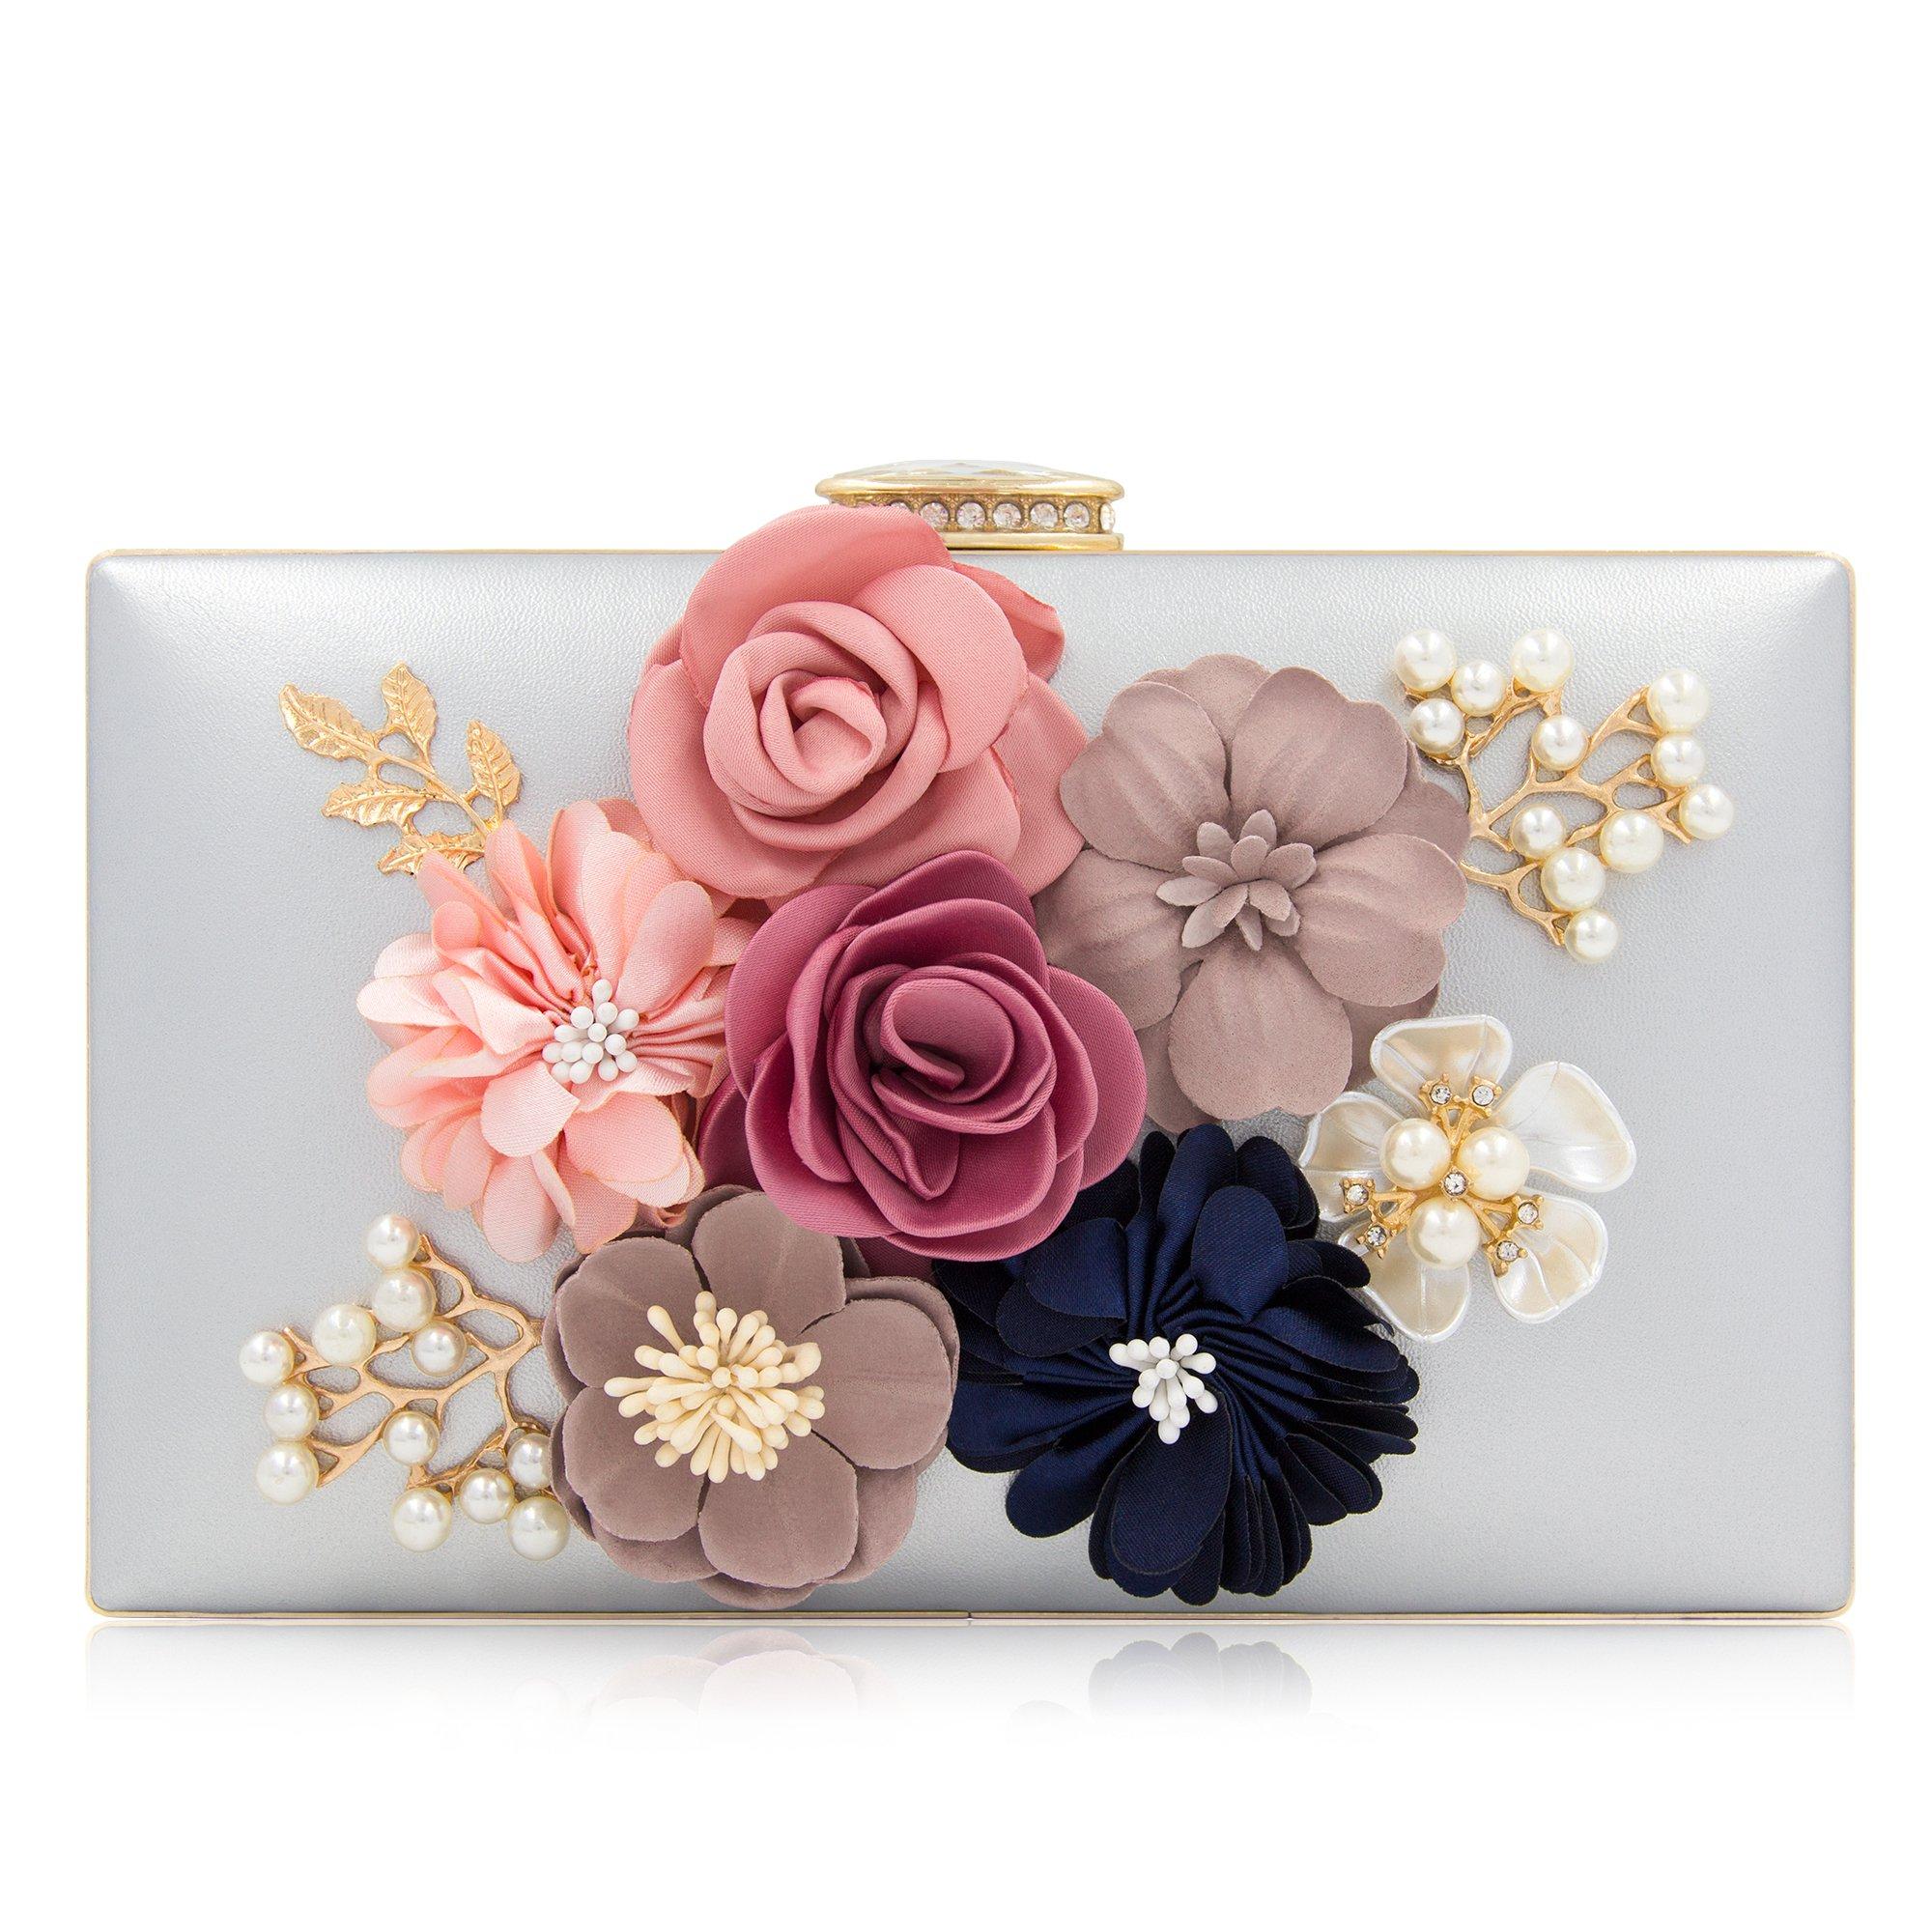 Milisente Women Flower Clutches Evening Bags Handbags Wedding Clutch Purse (Silver)